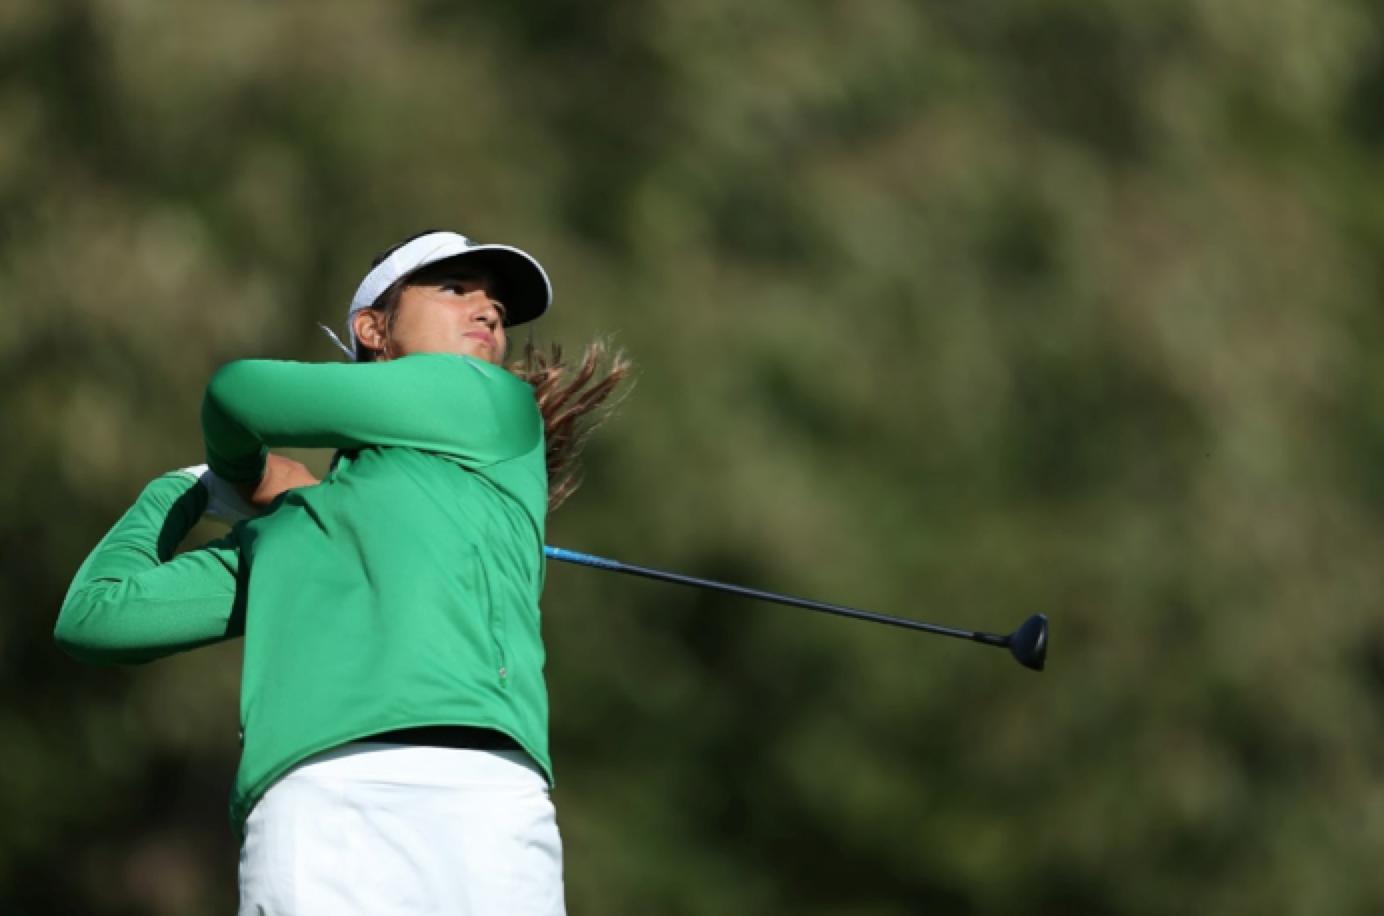 msu women s golf does creative recruiting to reach spanish star wkar